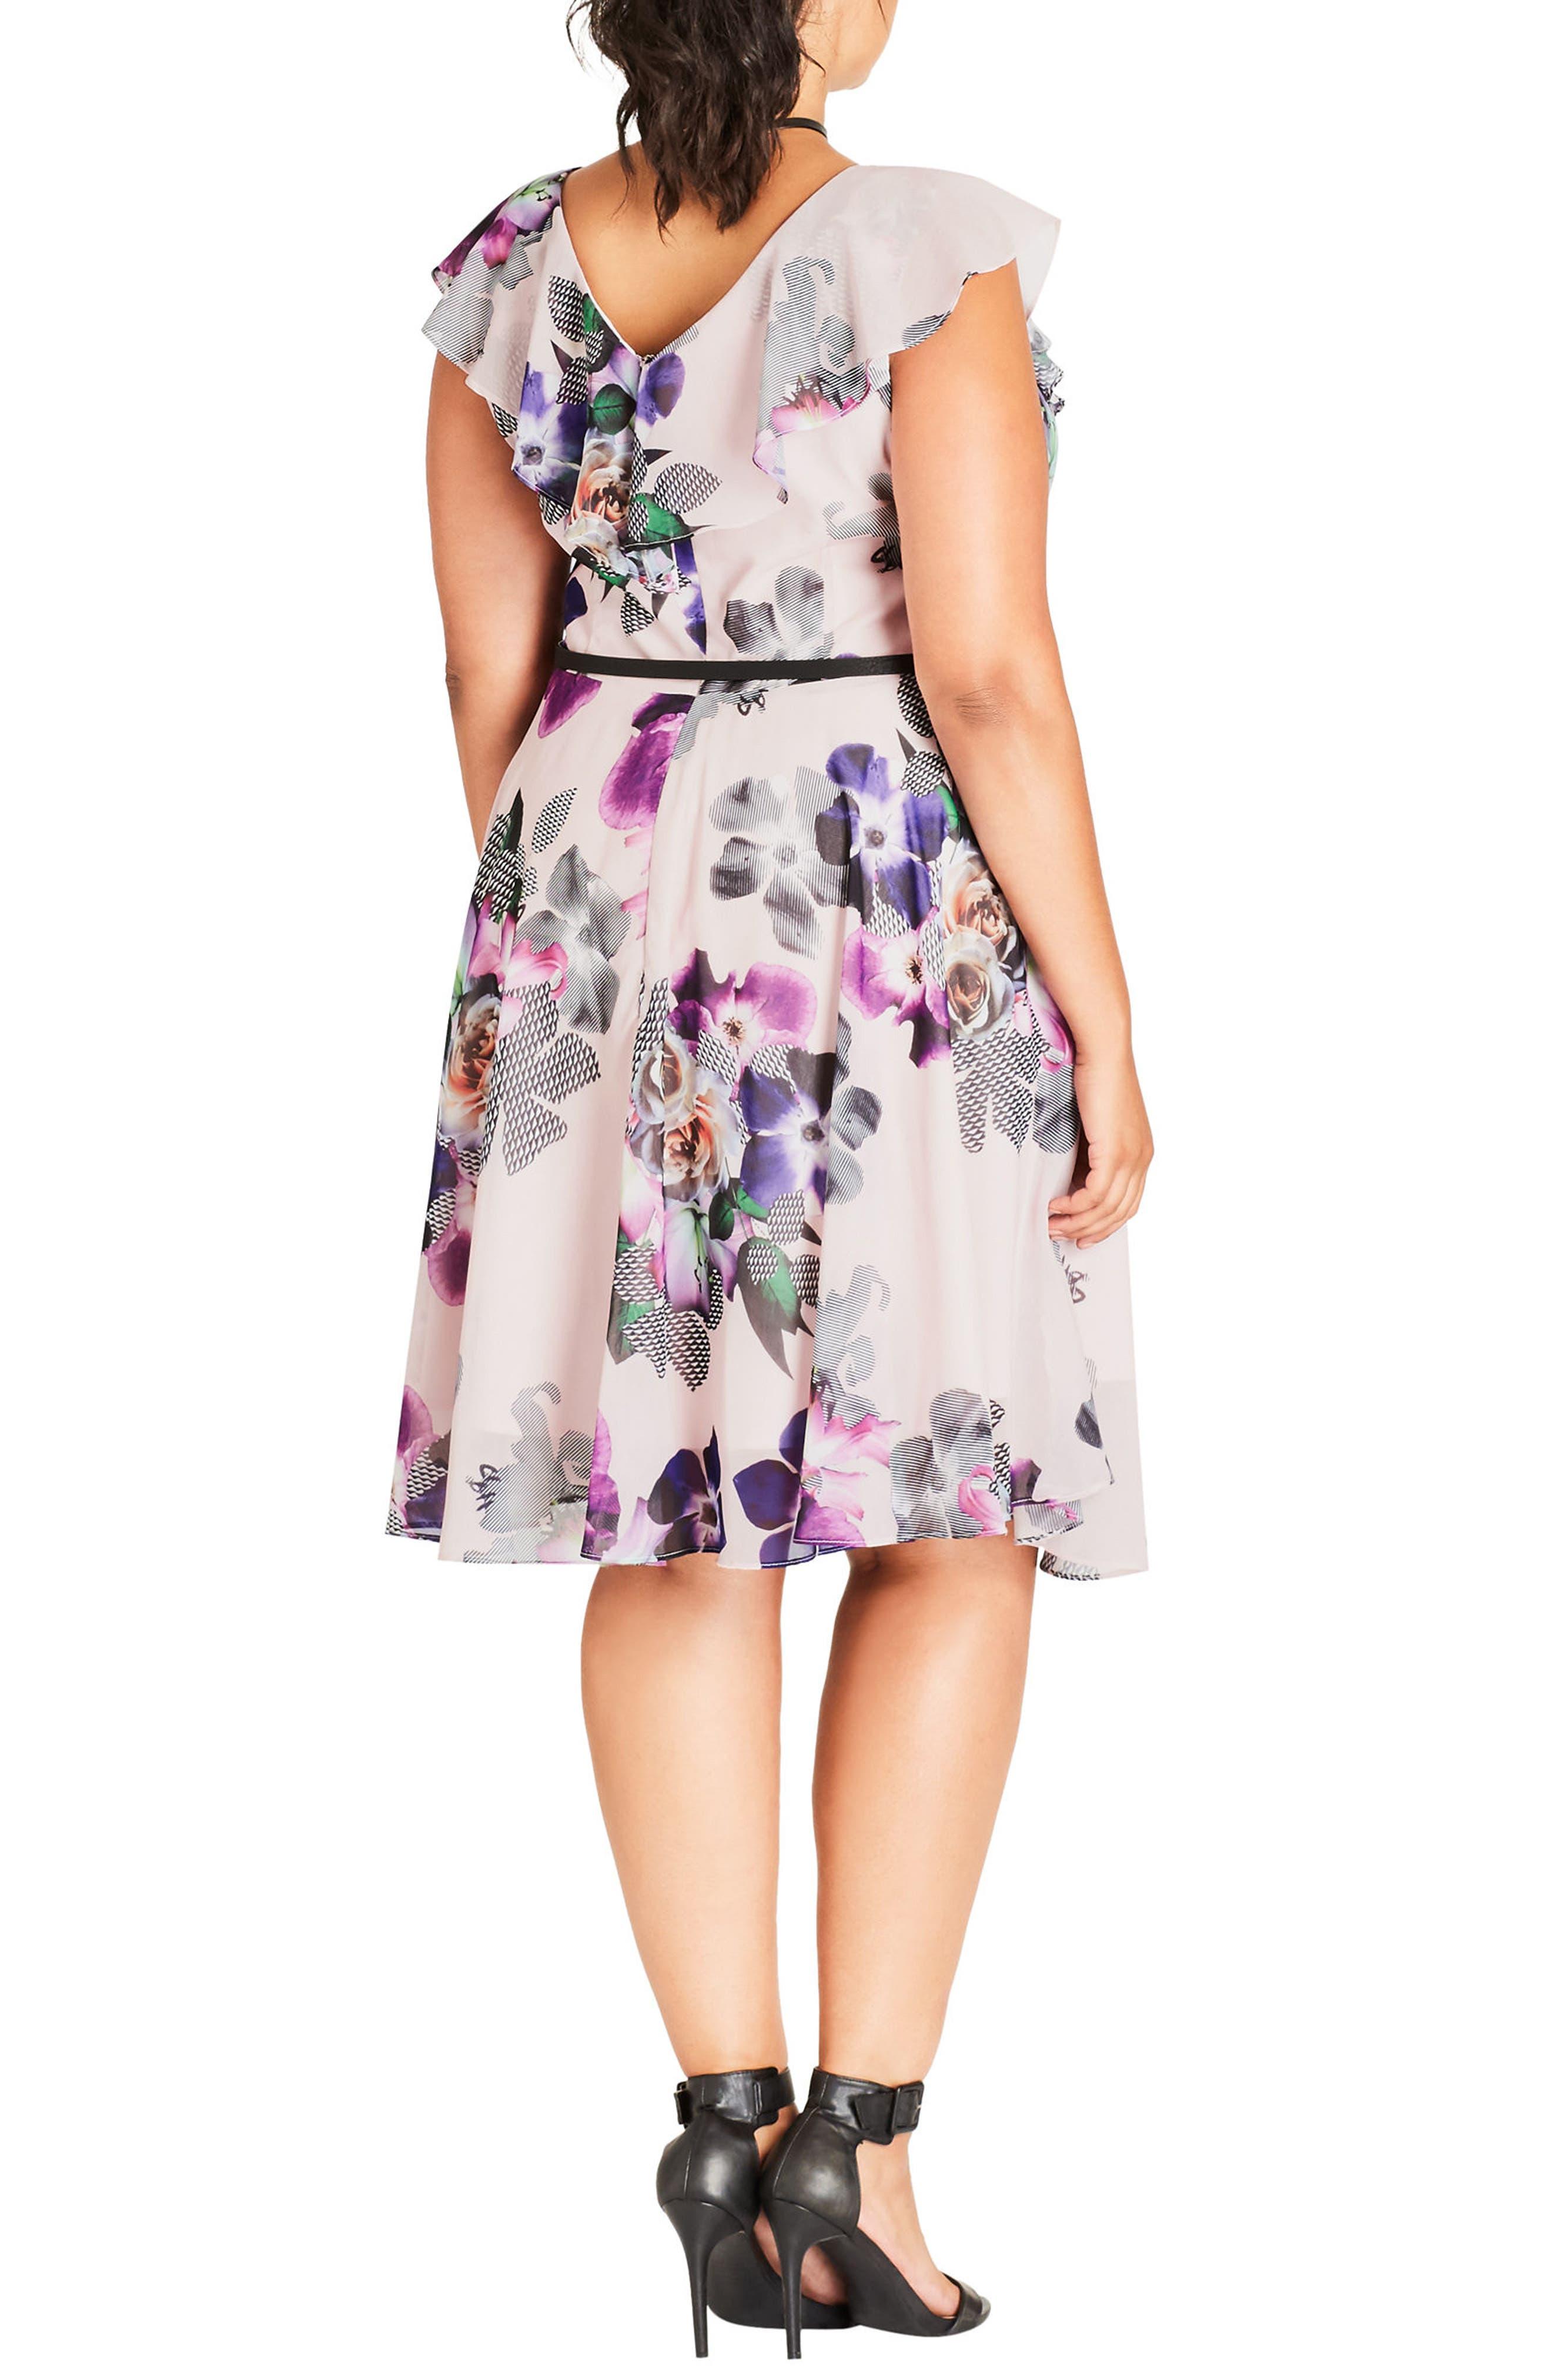 Romance Ruffle Floral Fit & Flare Dress,                             Alternate thumbnail 2, color,                             Passion Floral